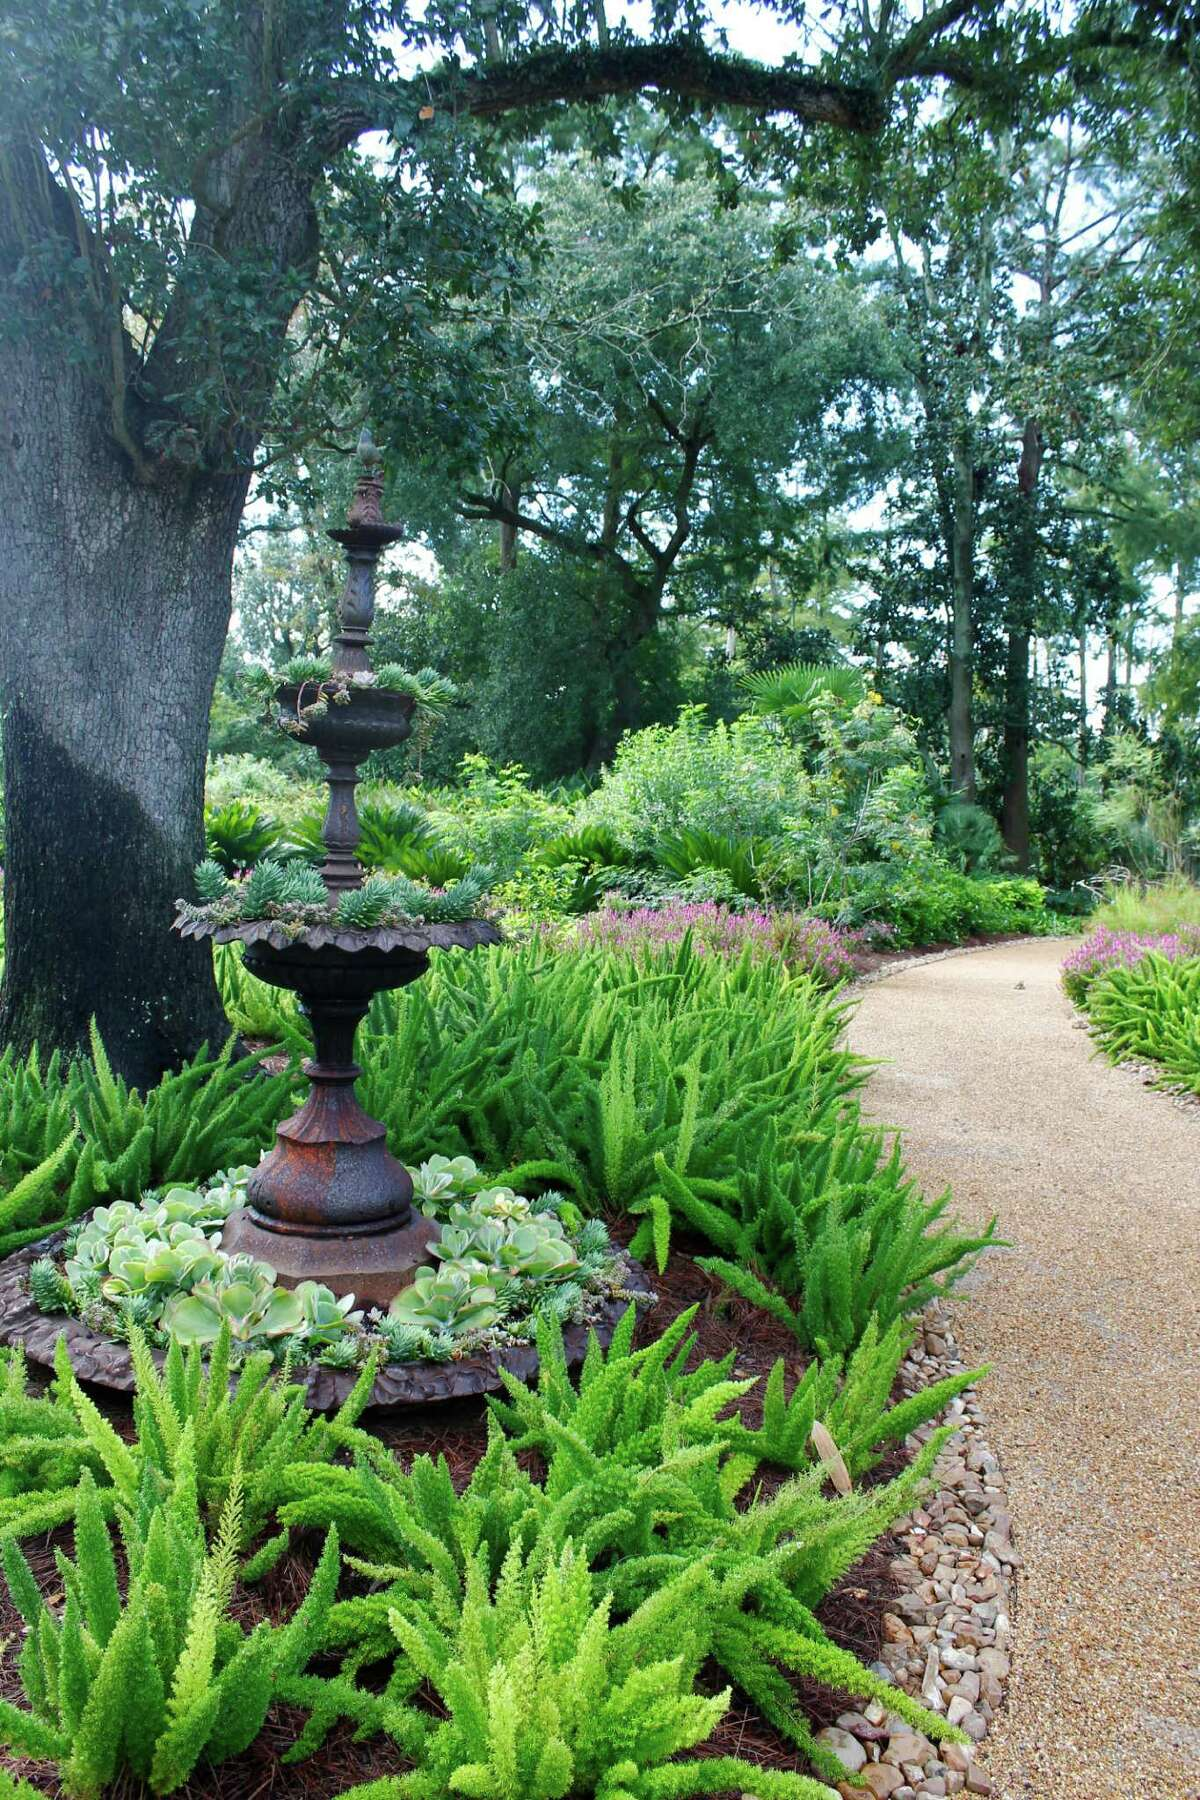 Shangri La Botanical Gardens in Orange, Texas, on Sept. 7, 2013.